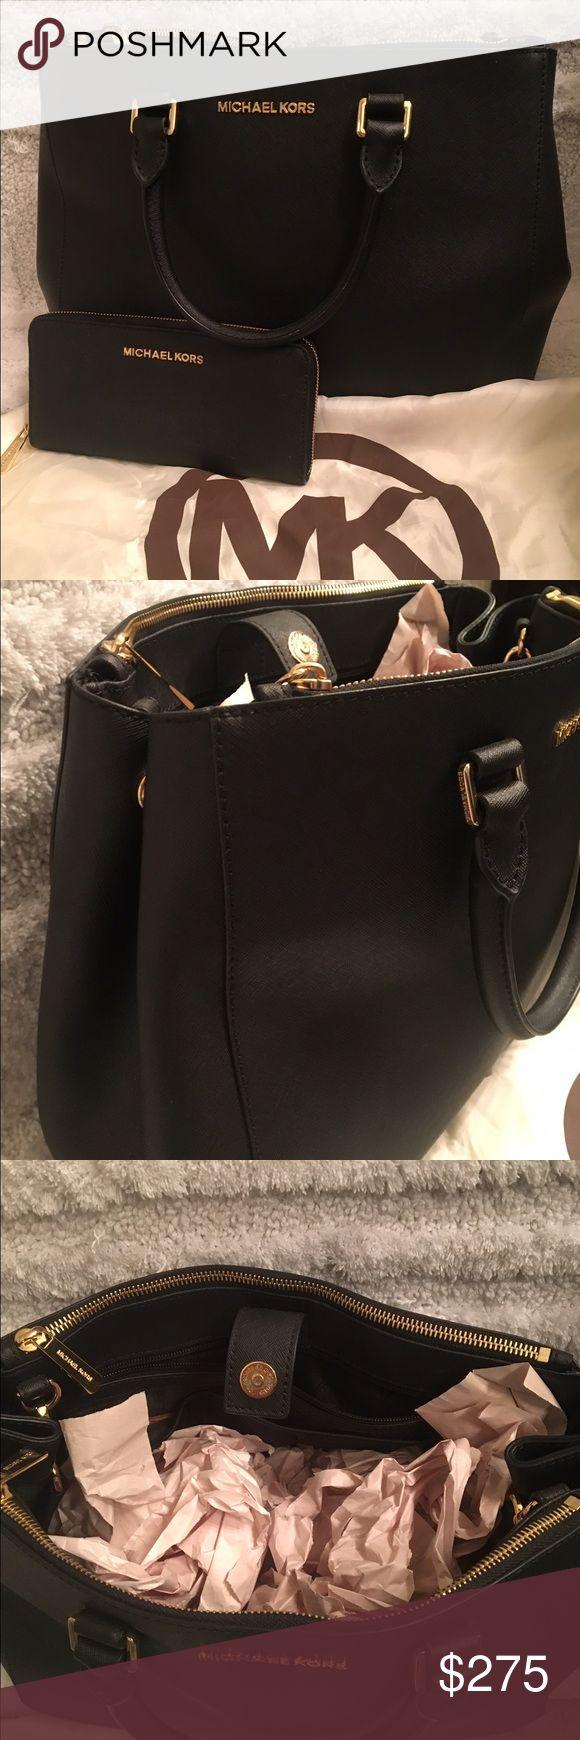 Michael Kors black purse and wallet Large gently used leather black Michael Kors purse and wallet Michael Kors Bags Totes